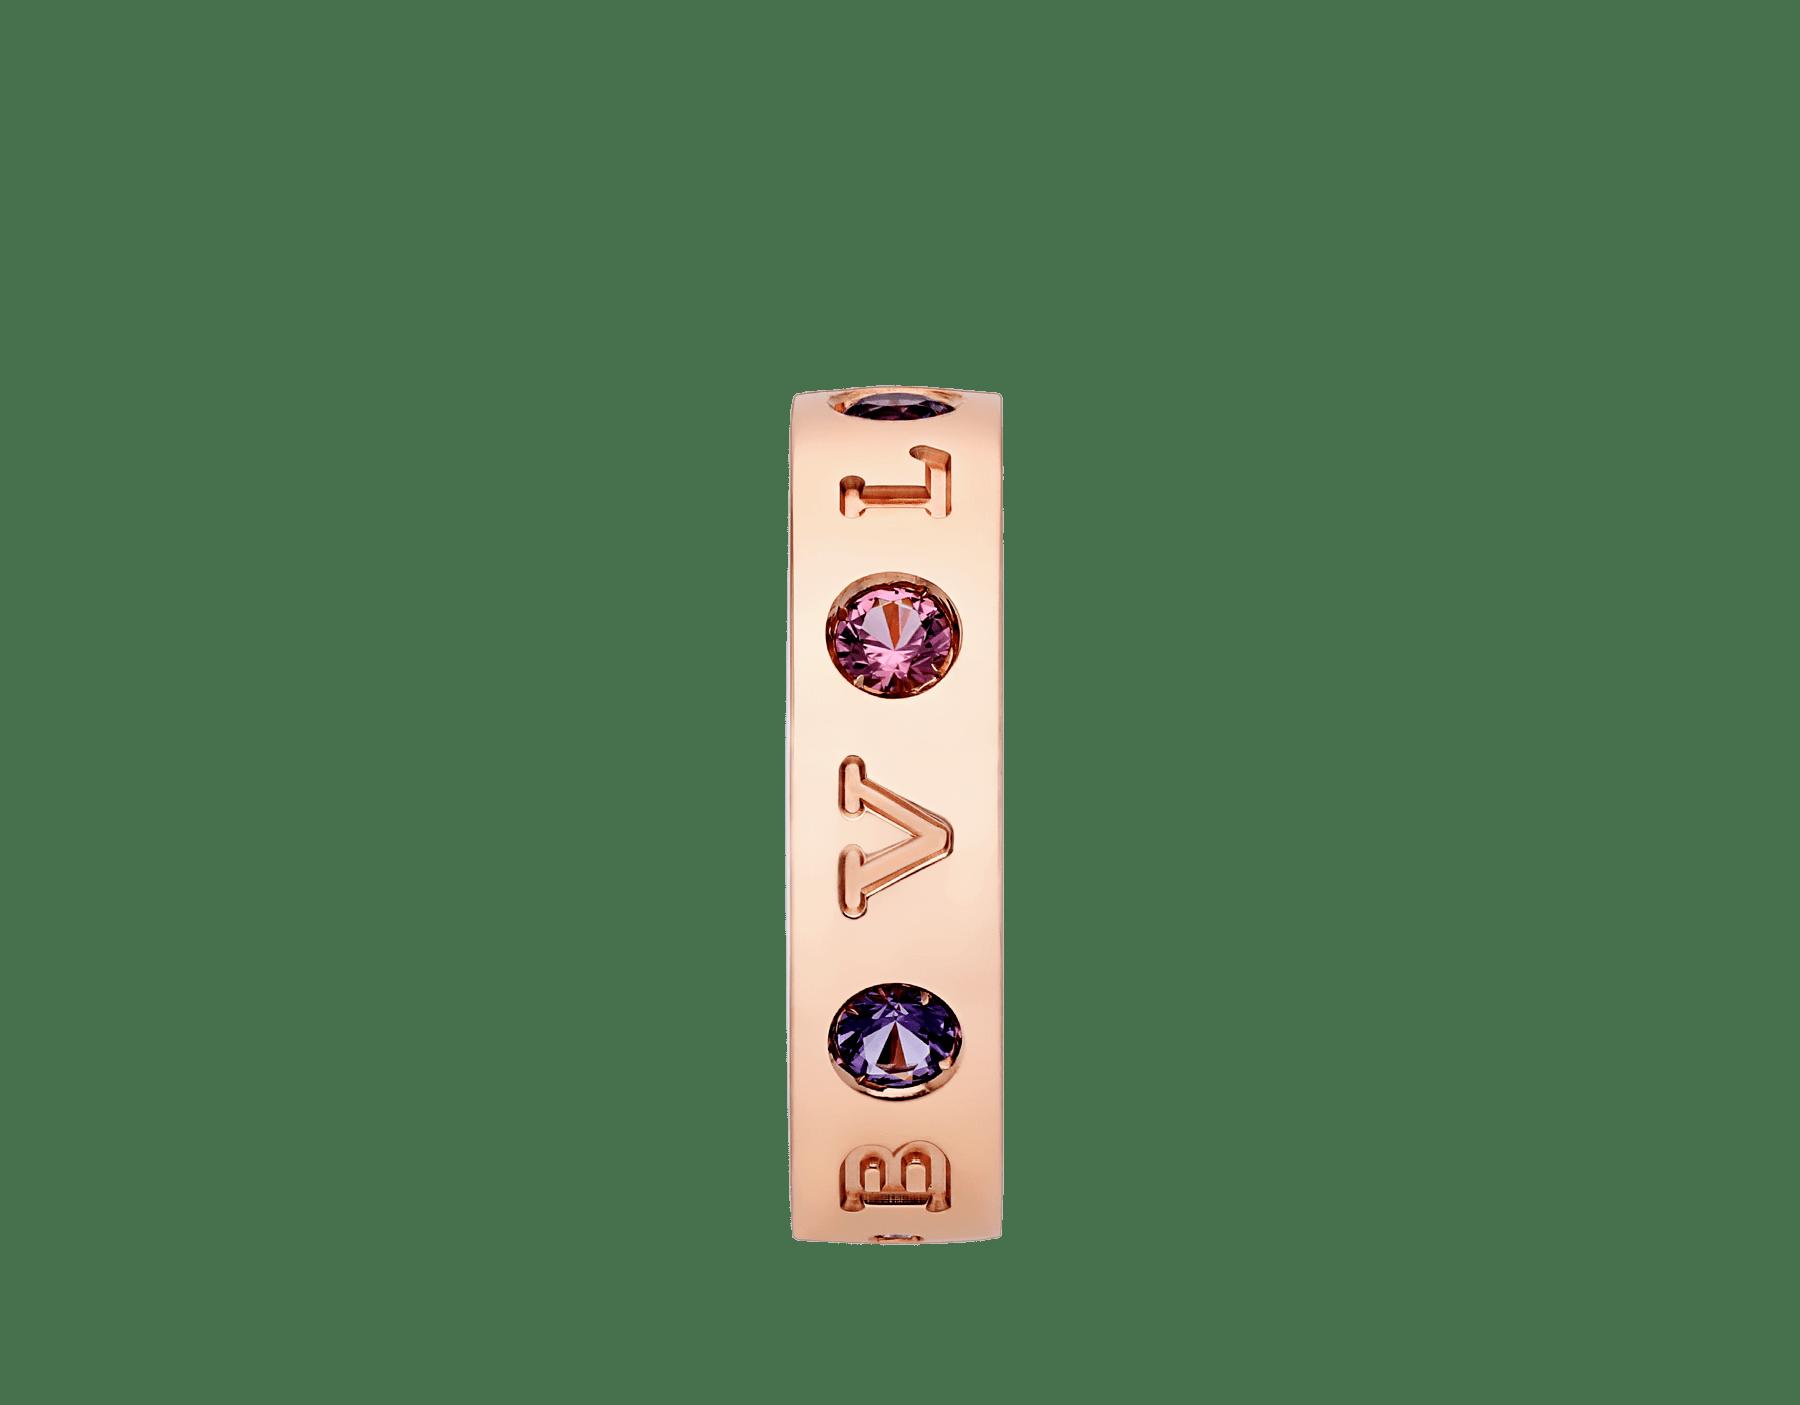 BVLGARI BVLGARI 18 kt rose gold ring set with amethysts and pink tourmalines AN857669 image 2